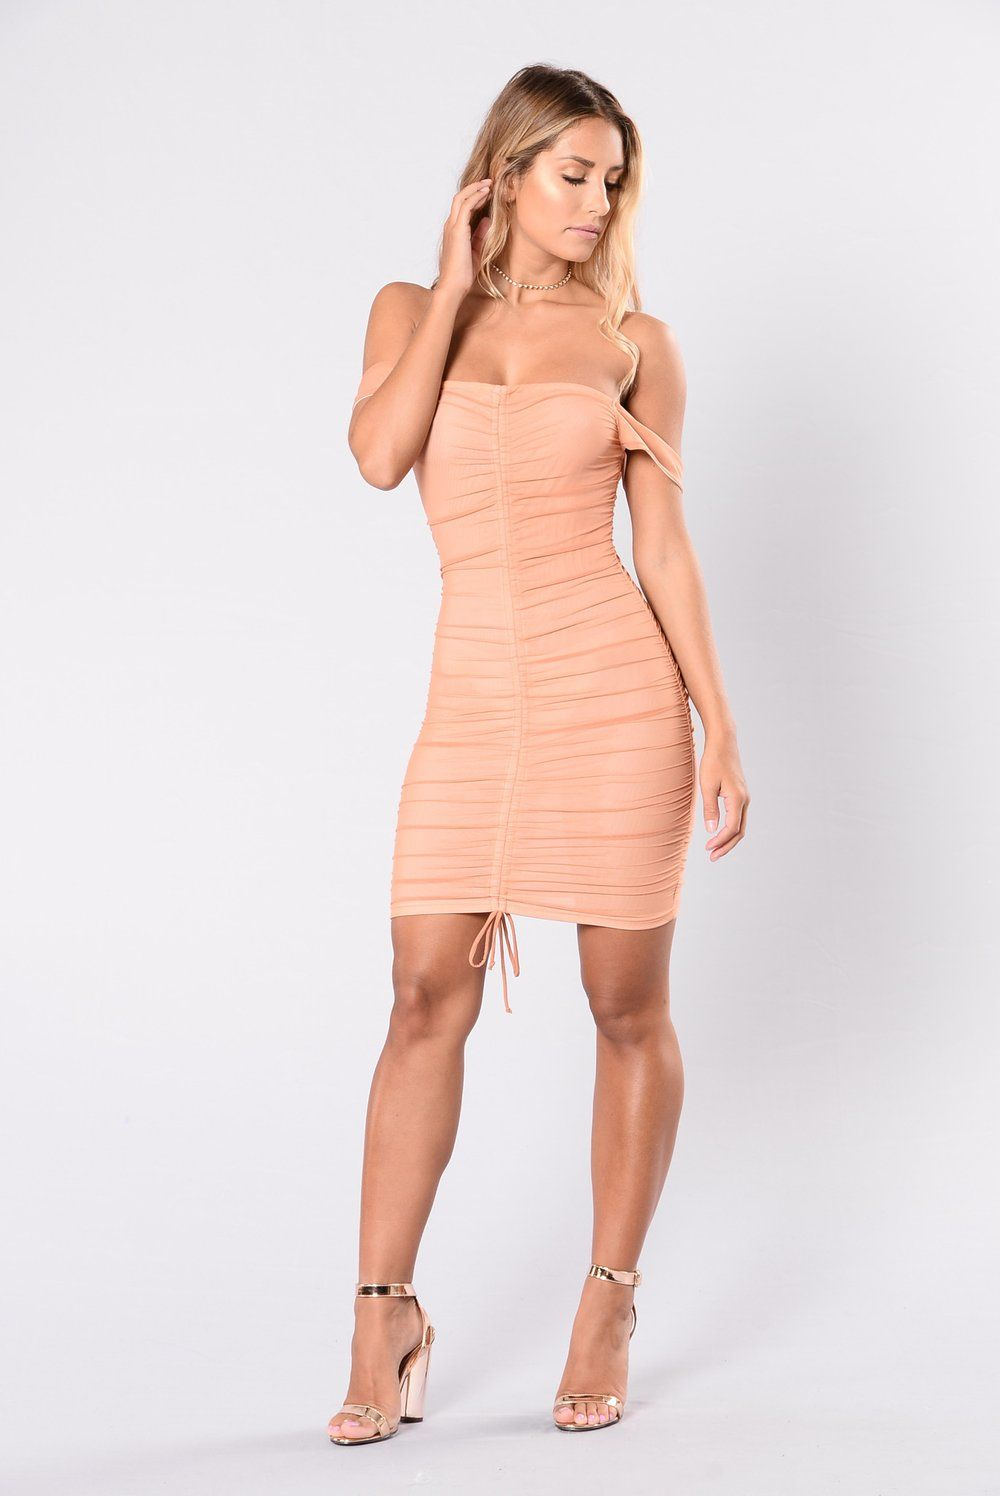 25+ Skin tight dress information